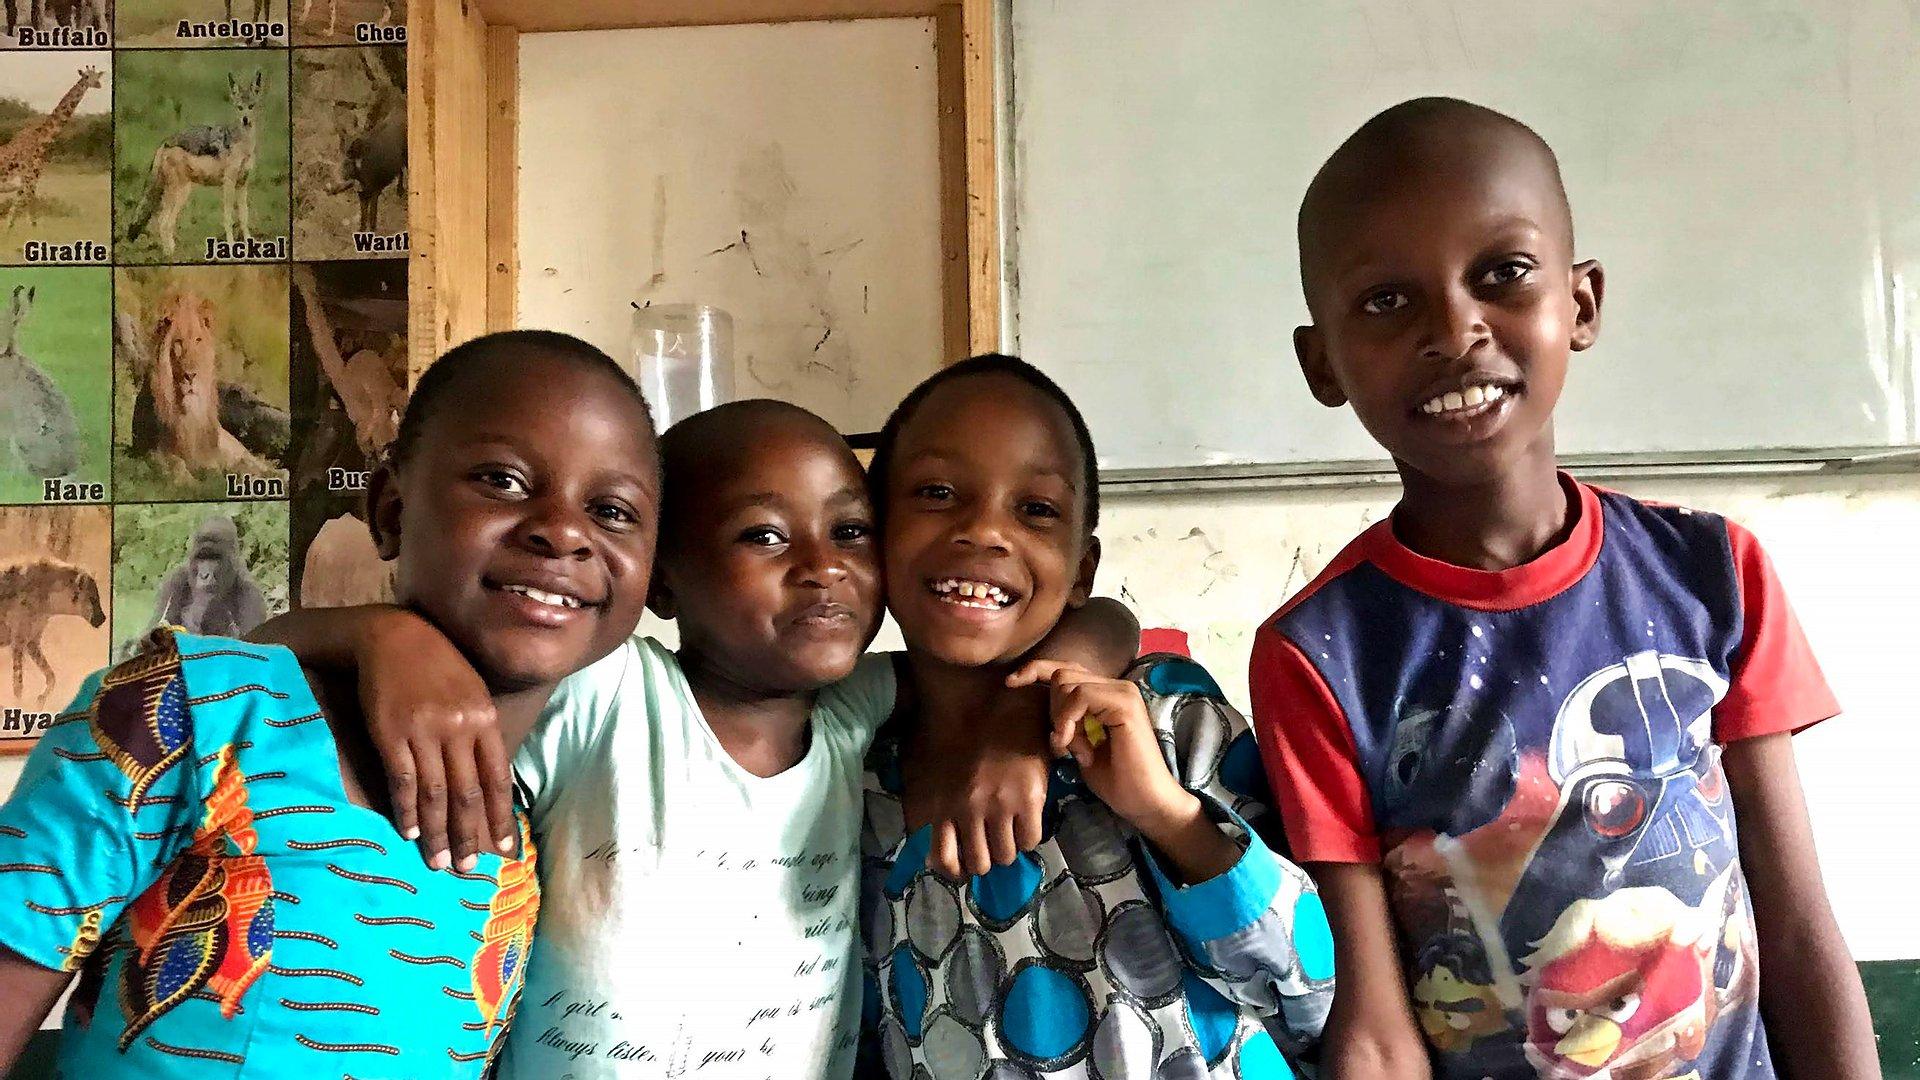 VOLUNTARIADO NA TANZÂNIA: como funciona na África